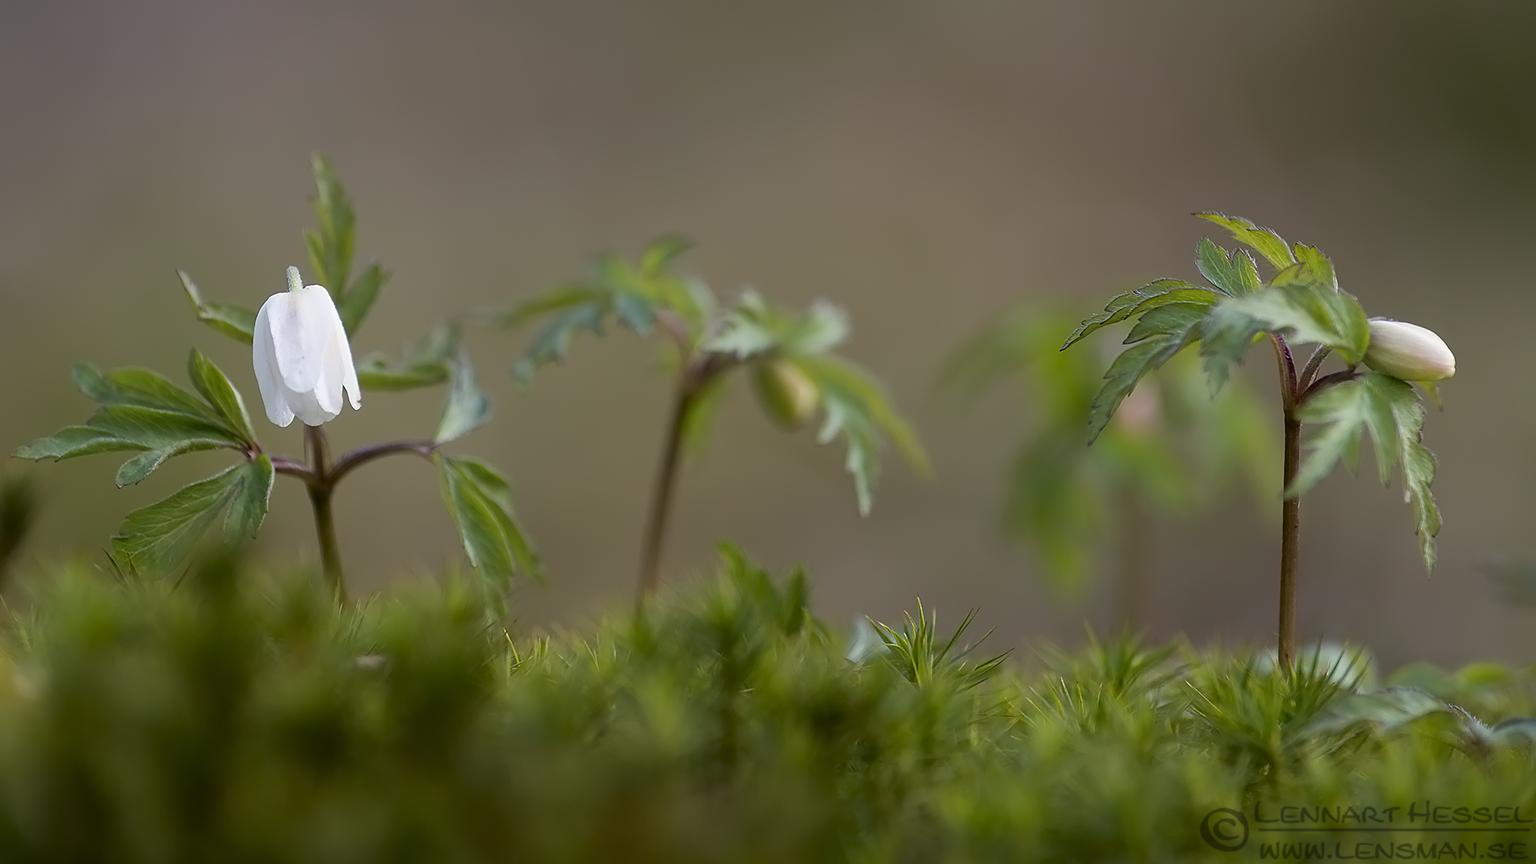 Wood Anemones Säveån